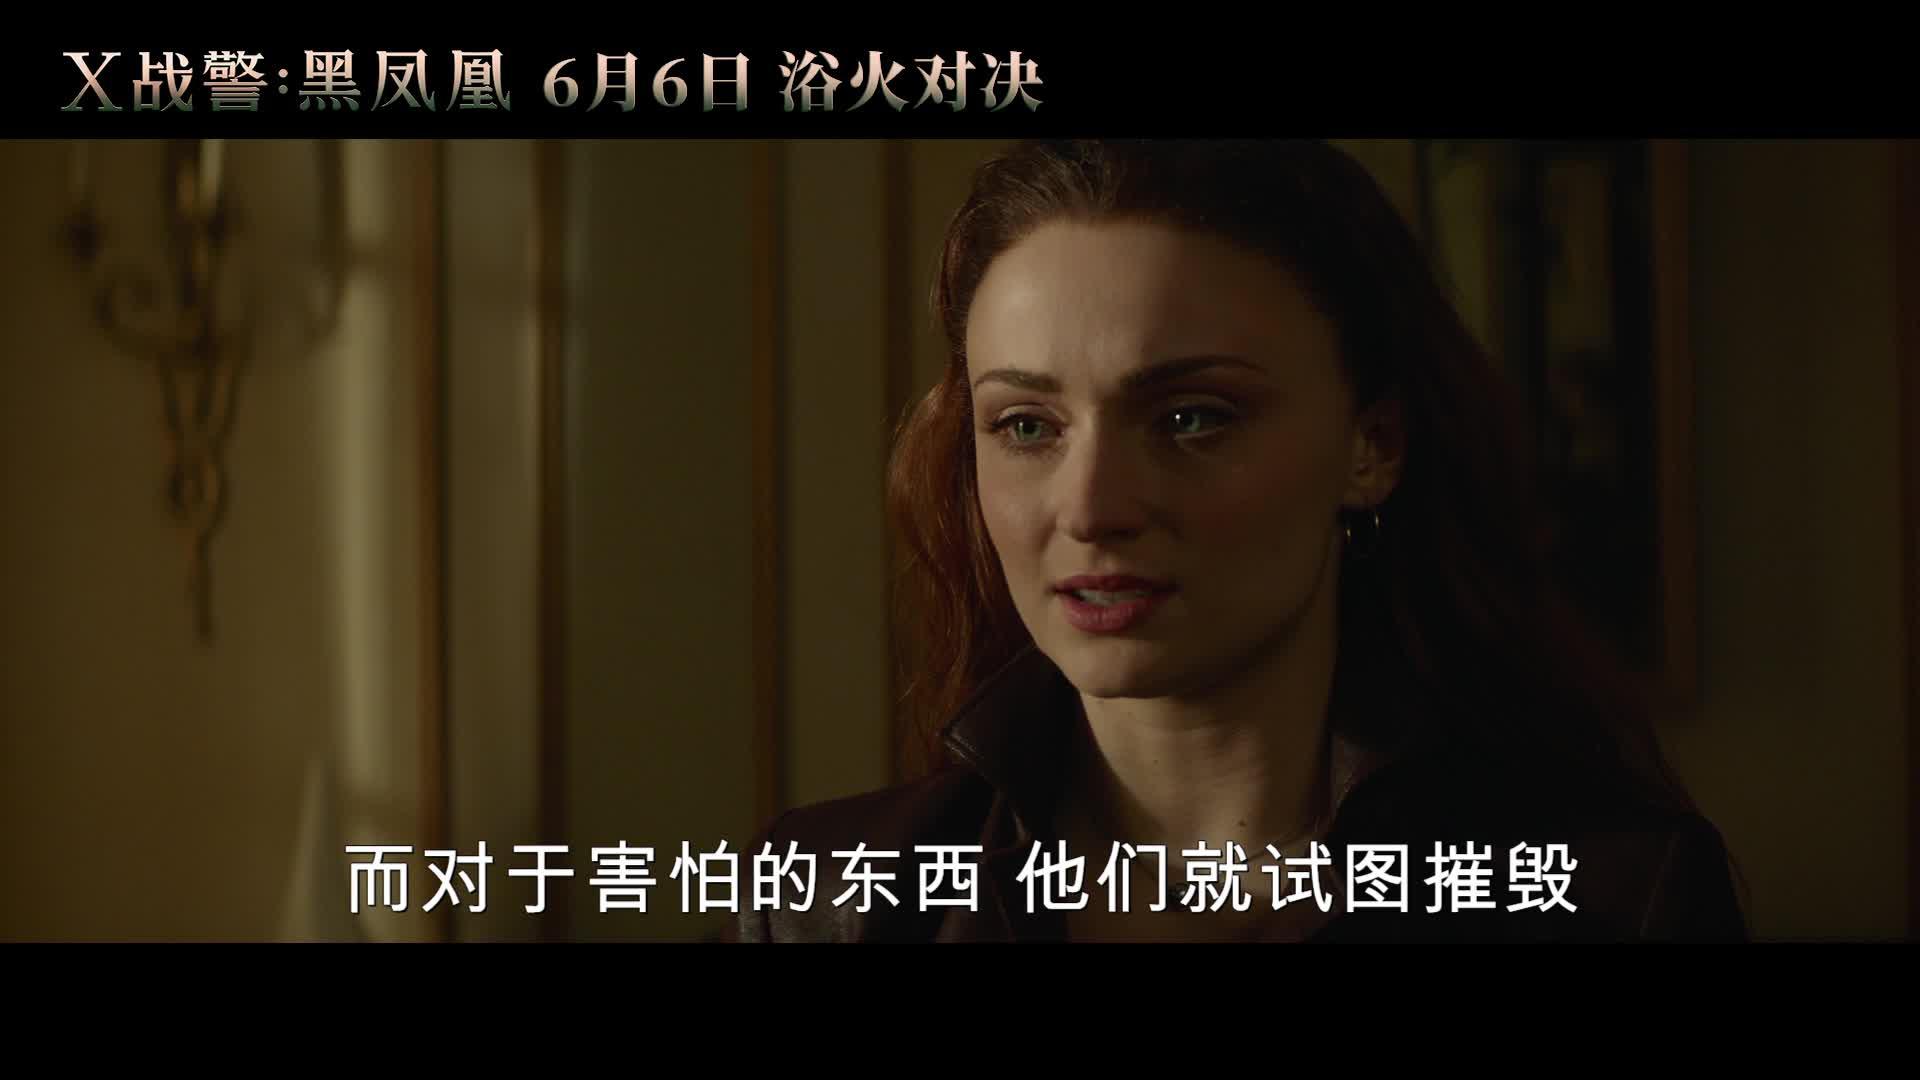 《X战警:黑凤凰》 预告片